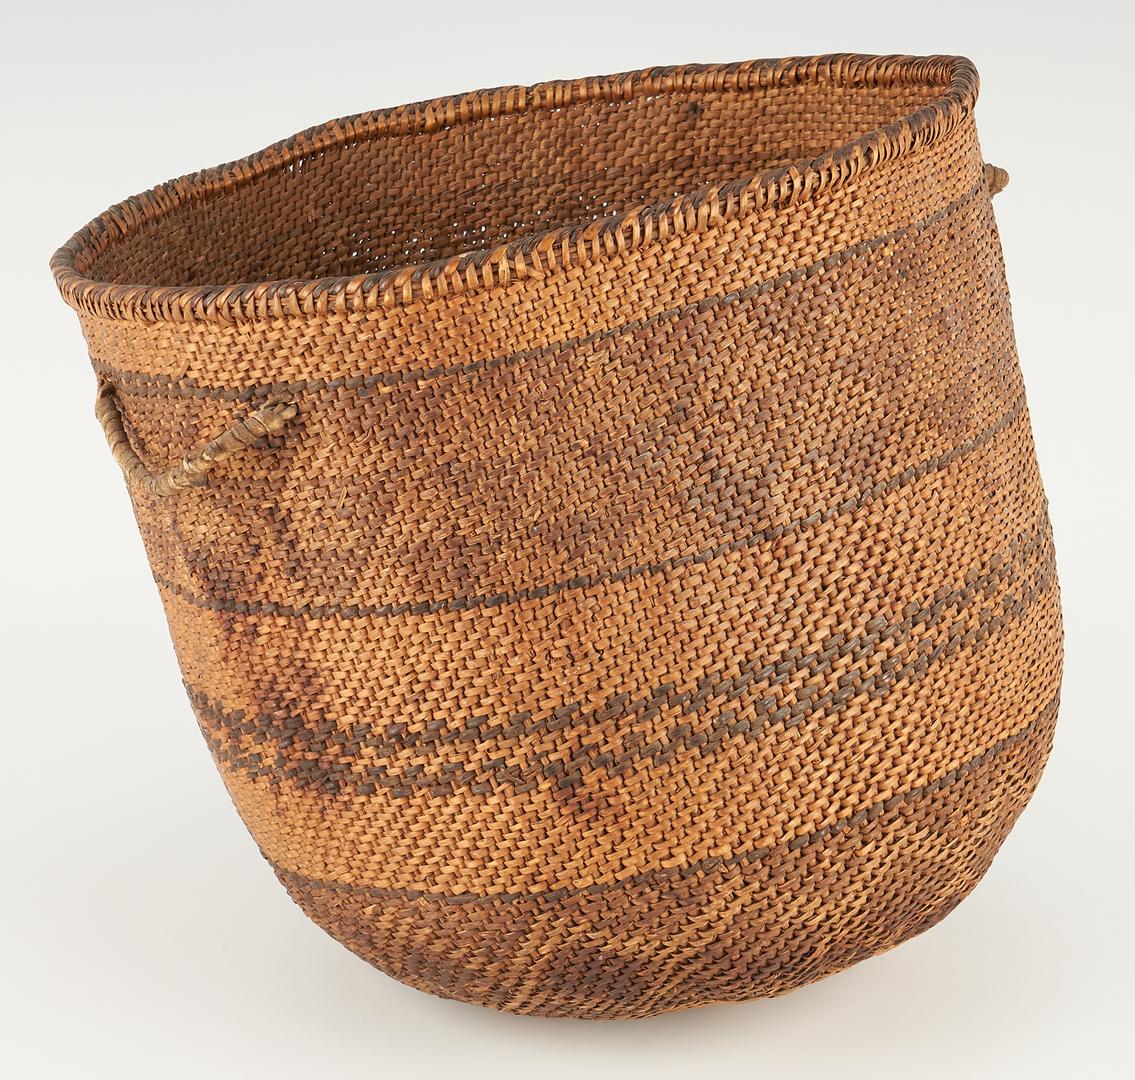 Lot 1099: California or Pacific Northwest Native American Storage Basket